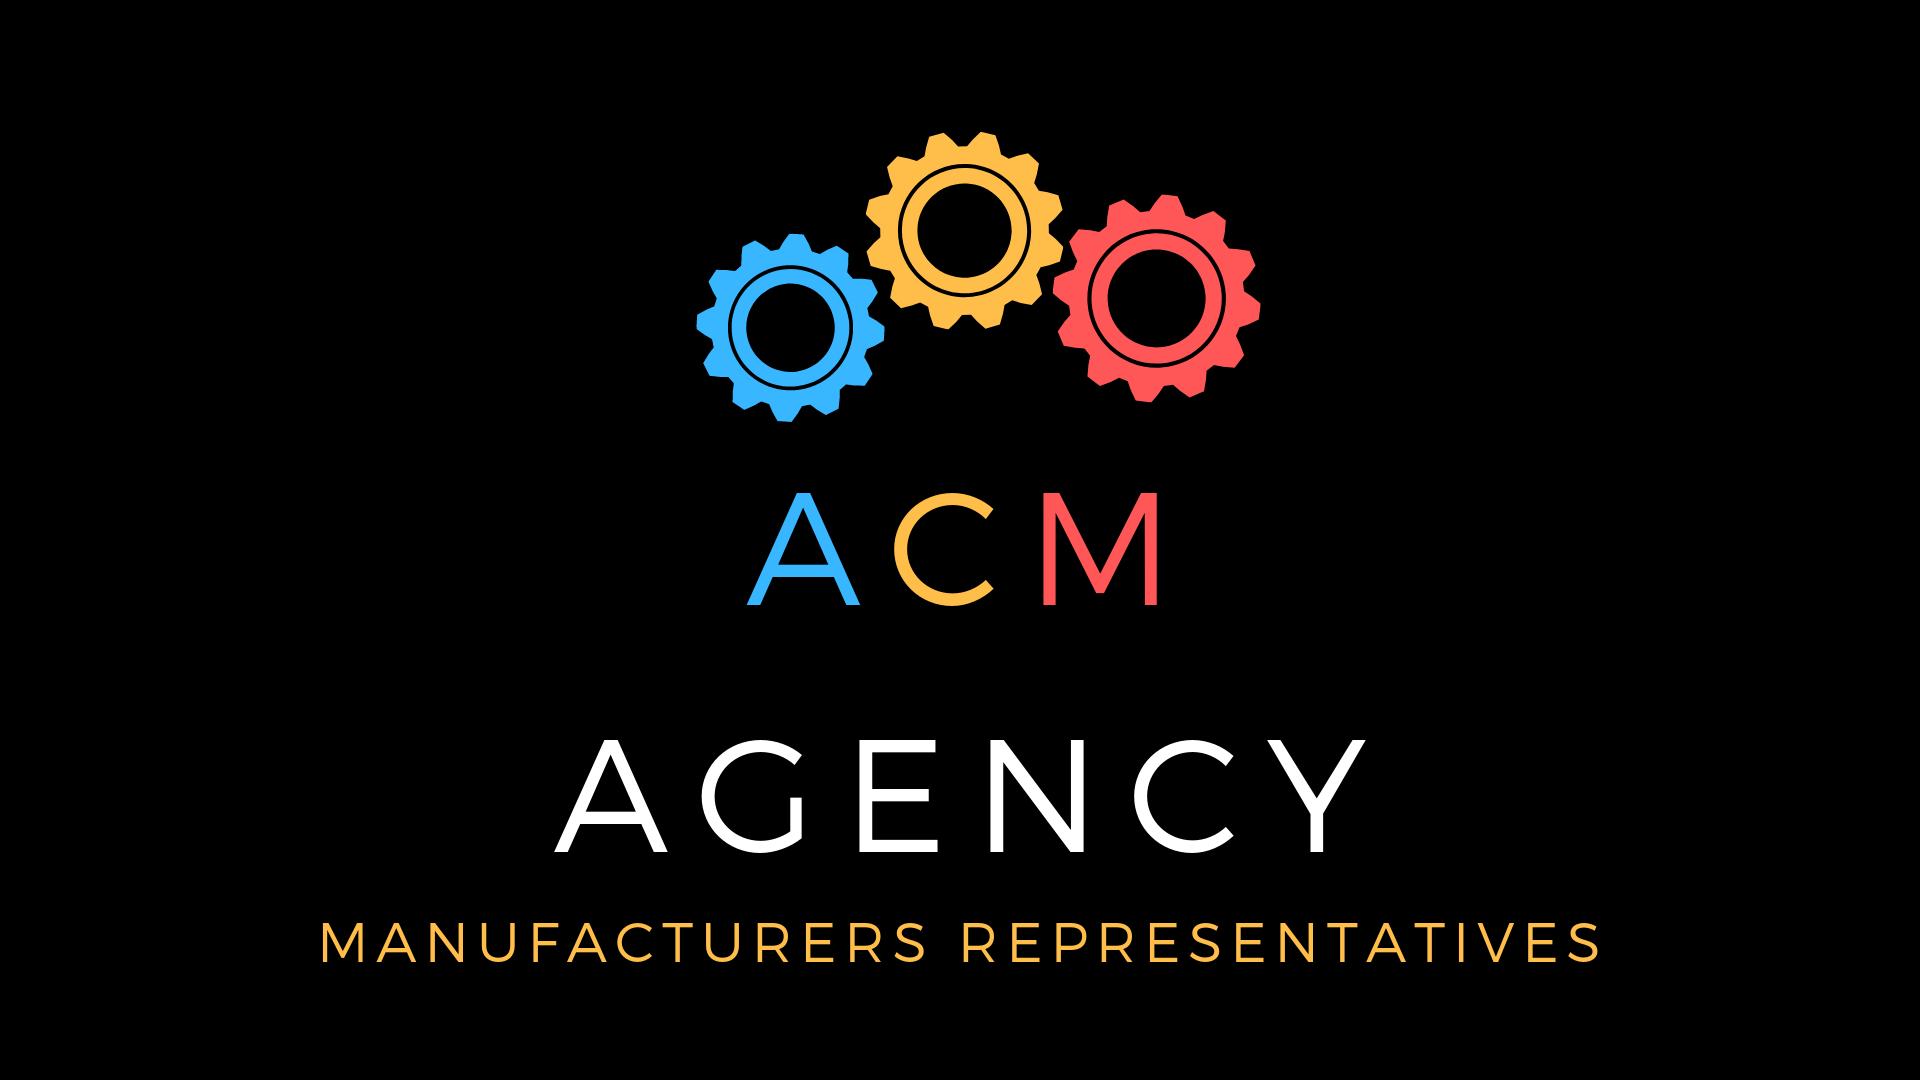 ACM Agency